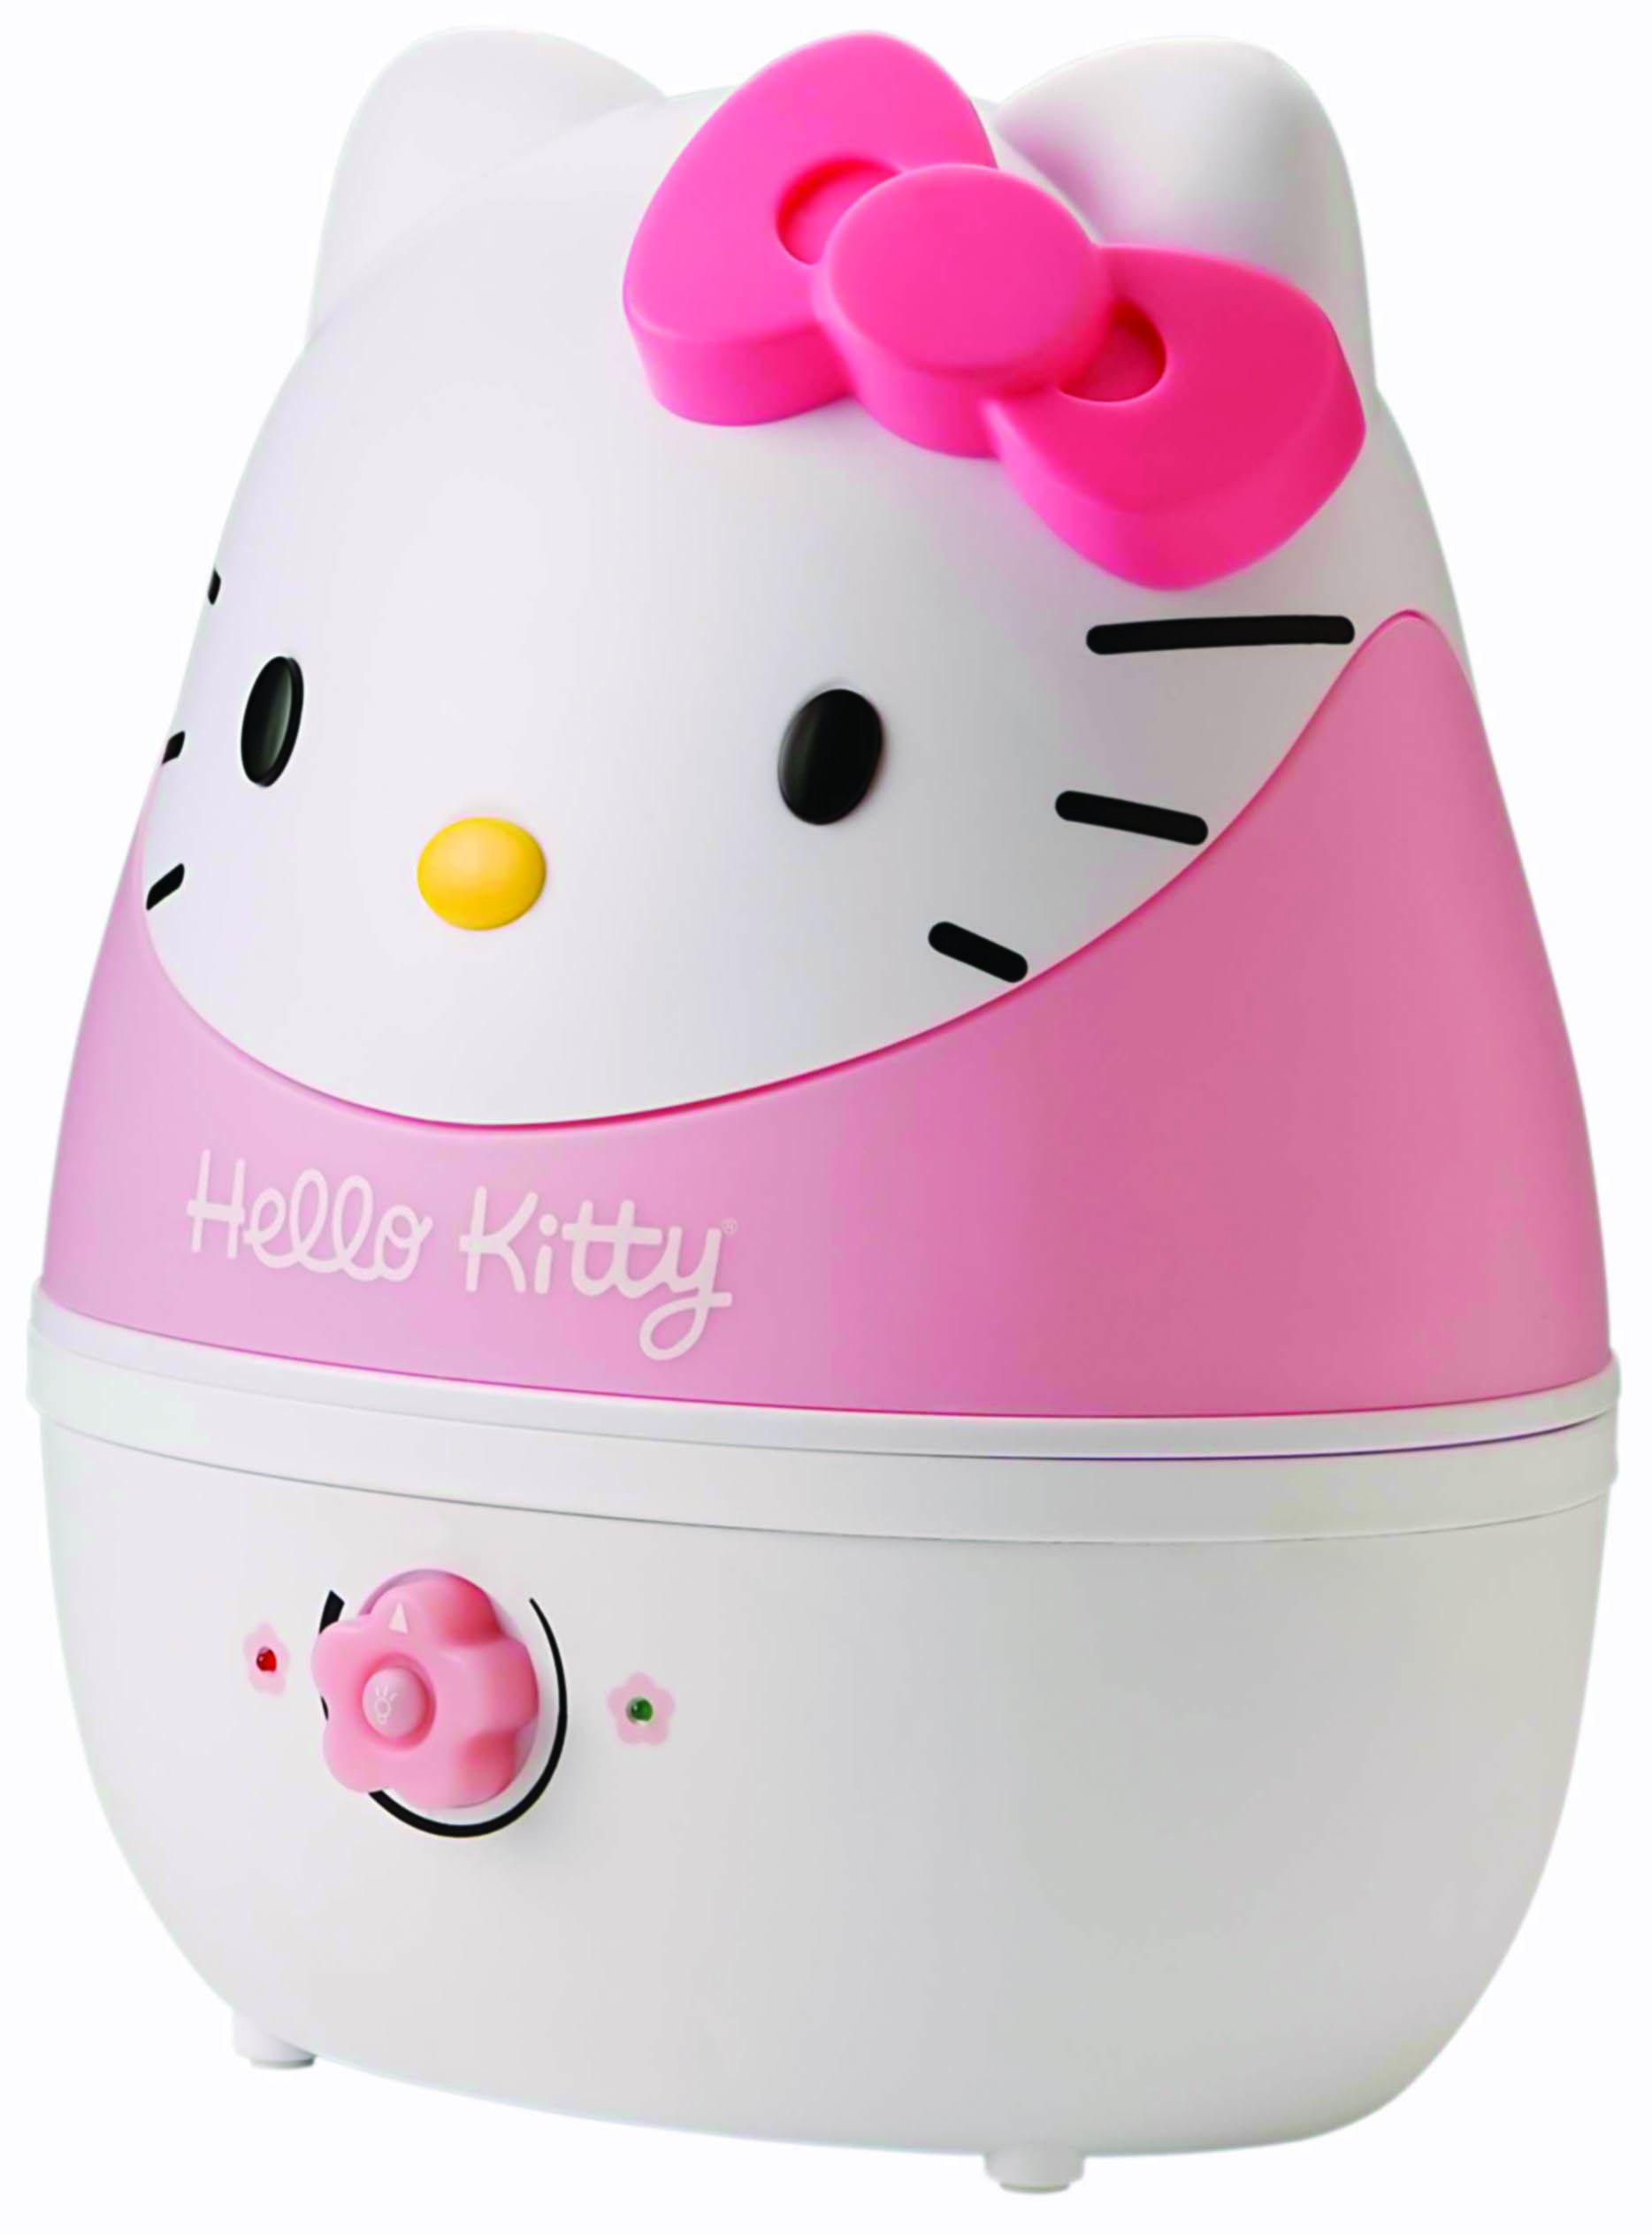 humidificateur talassio hello kitty toilette hello kitty hello kitty rooms et hello kitty. Black Bedroom Furniture Sets. Home Design Ideas